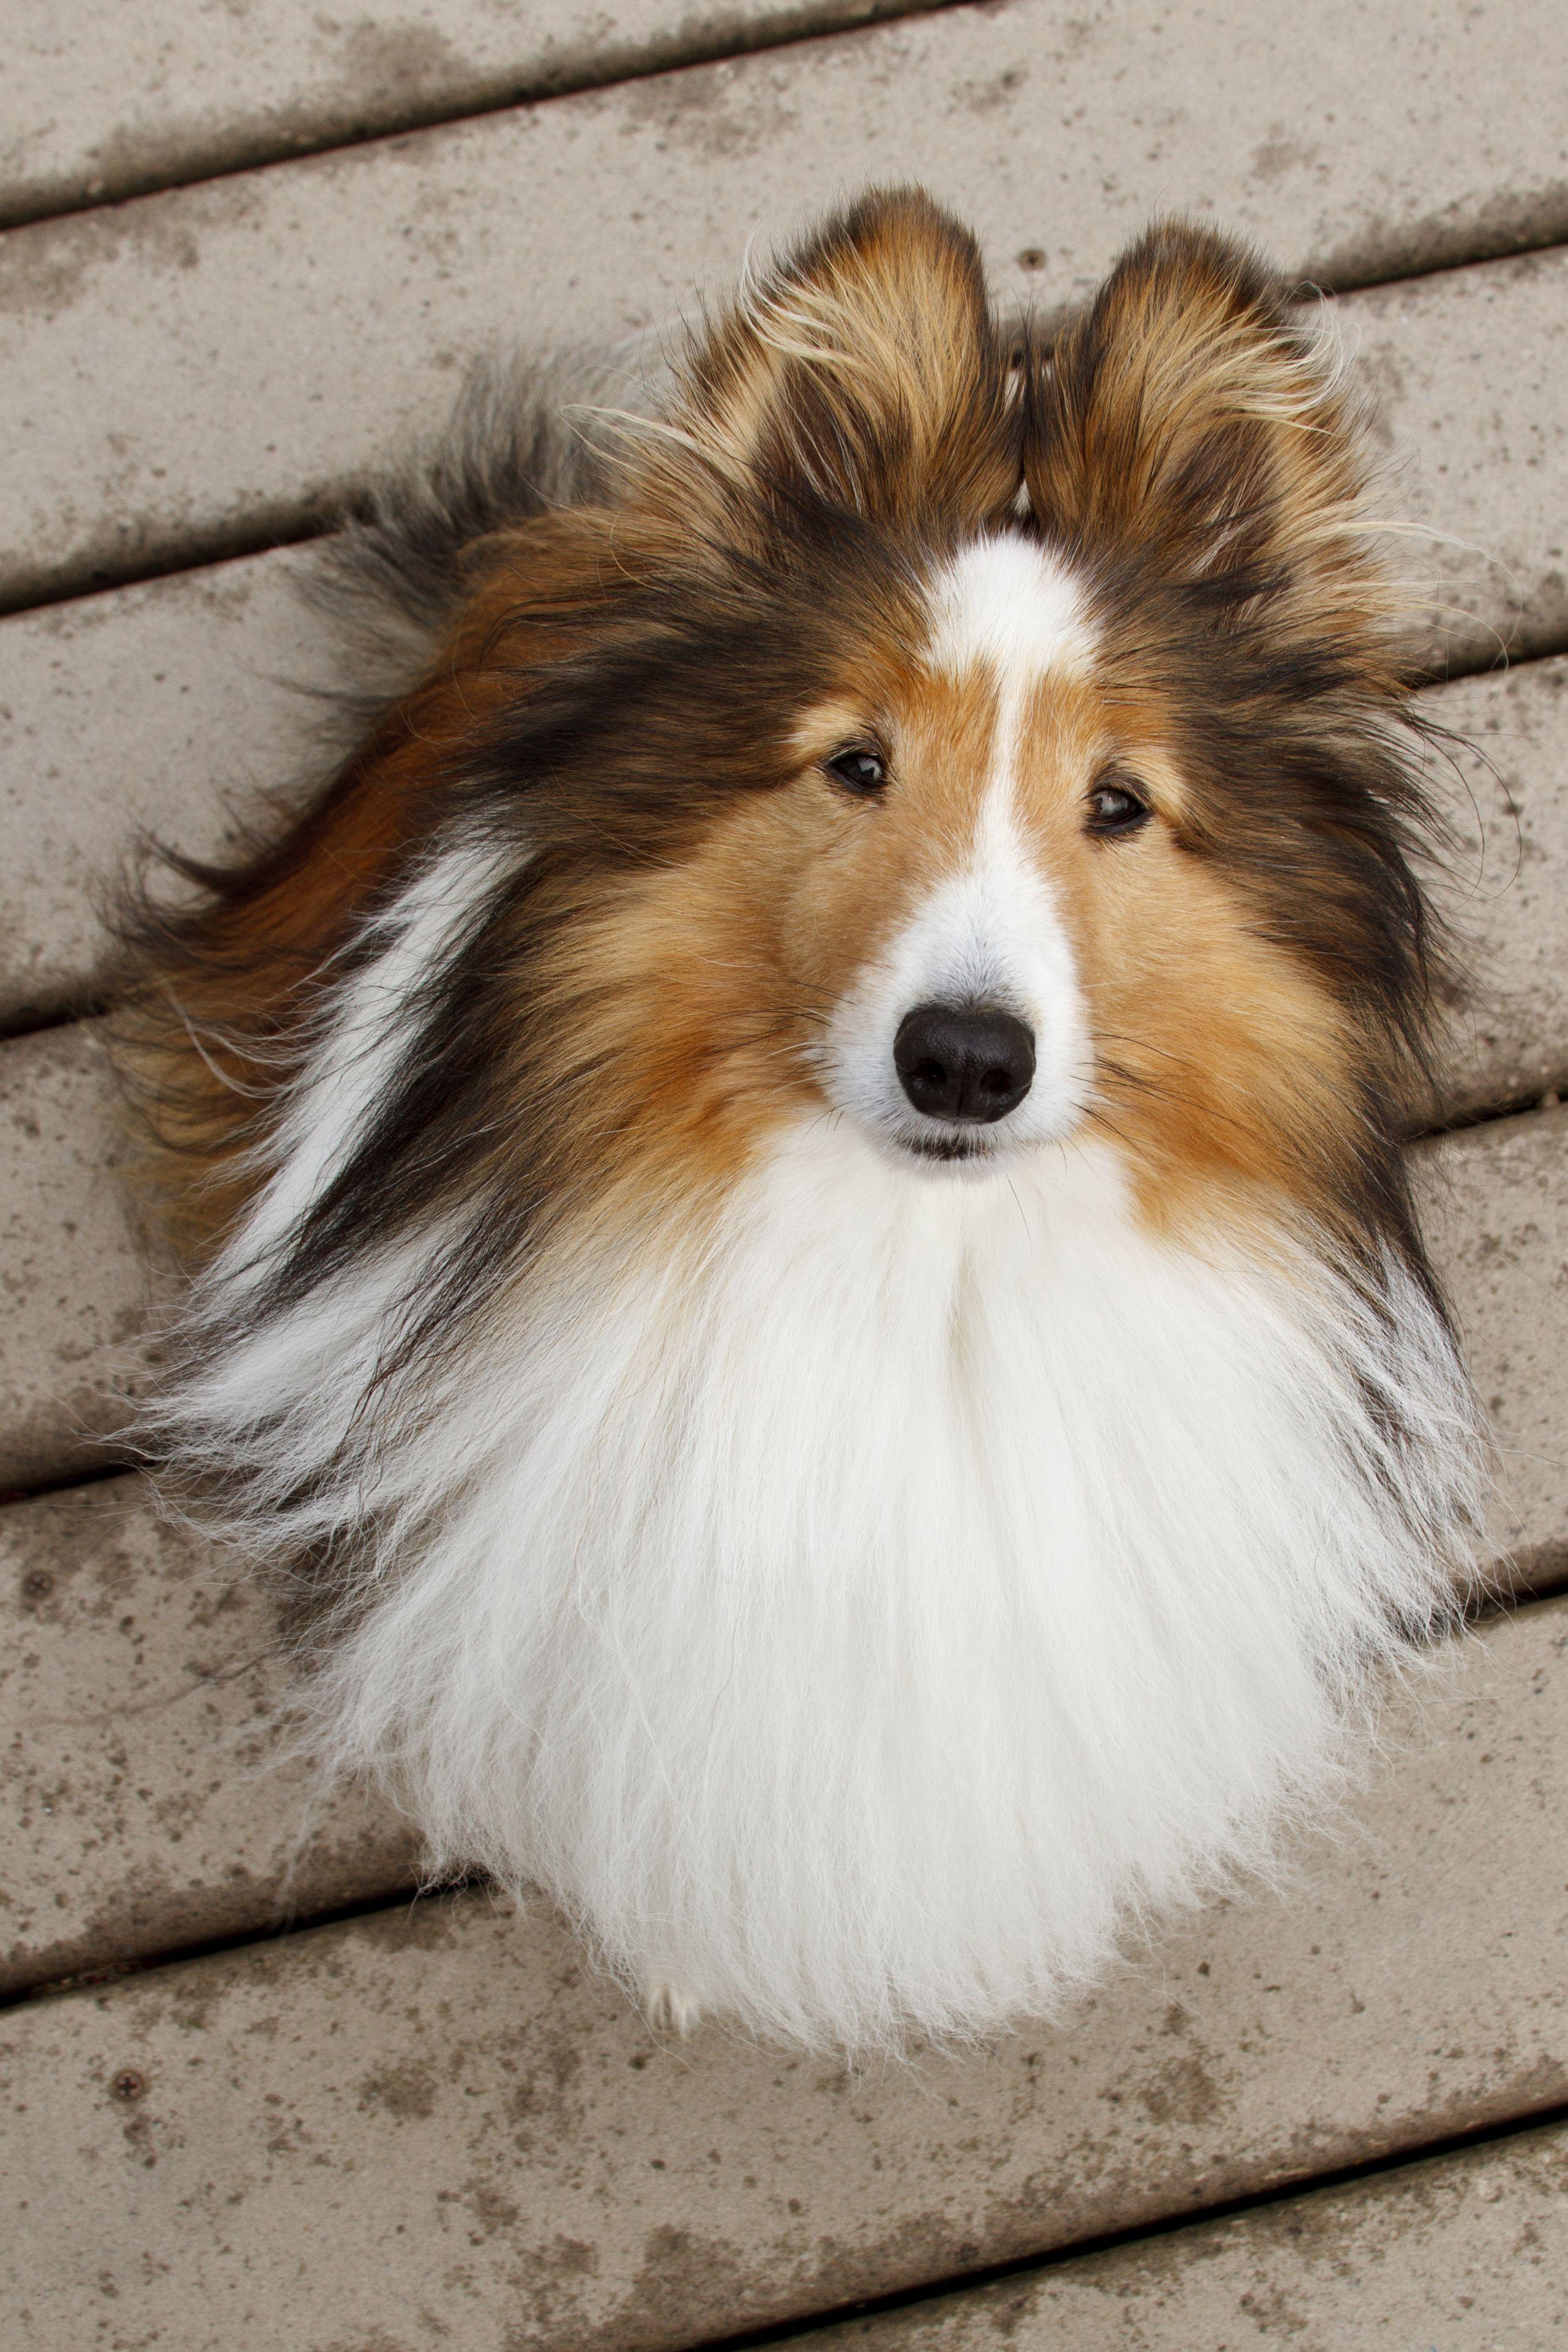 Popular Icelandic Sheepdog Canine Adorable Dog - shetland-sheepdog  You Should Have_188284  .jpg